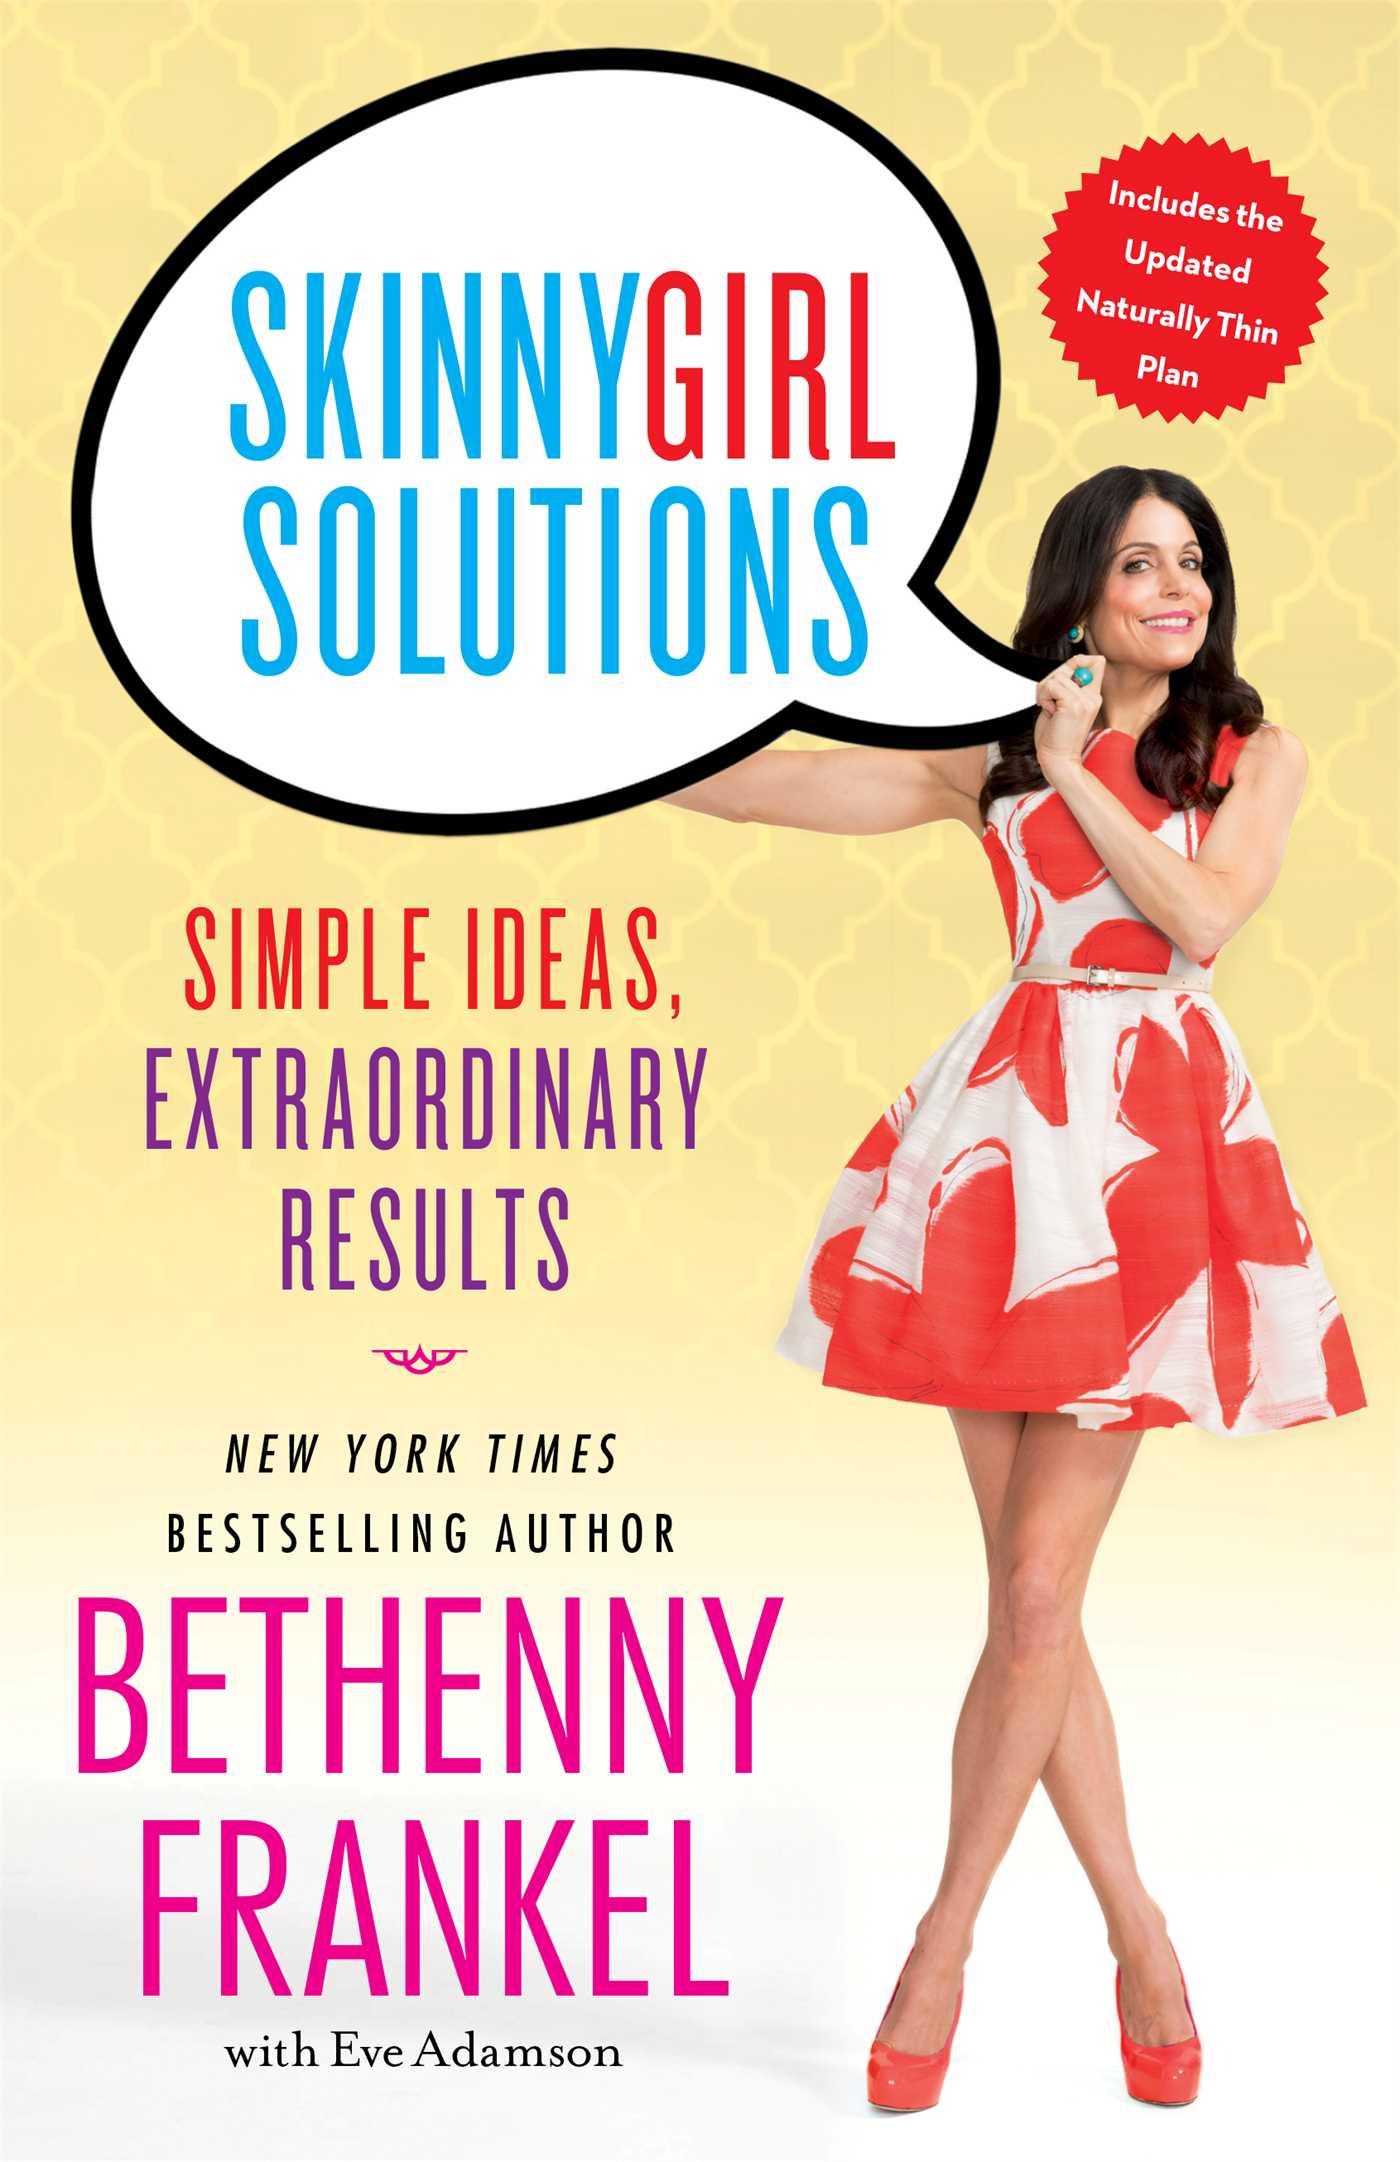 Skinnygirl solutions 9781451667400 hr